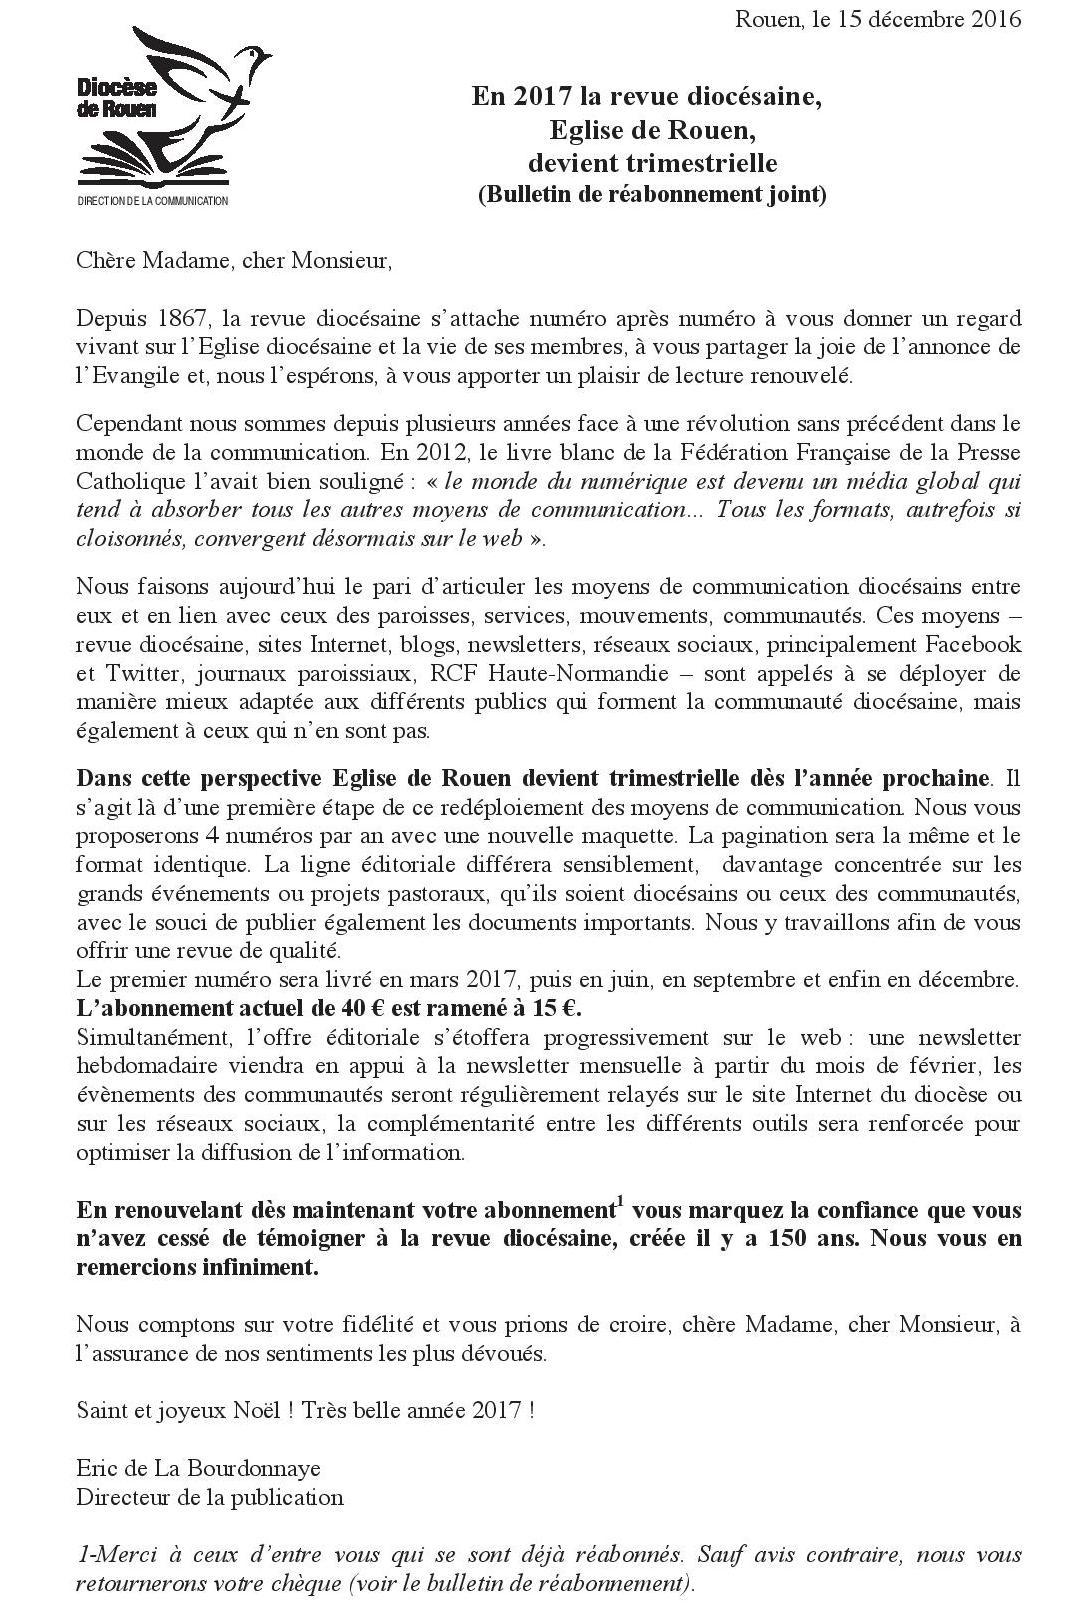 edr-lettre-page-001